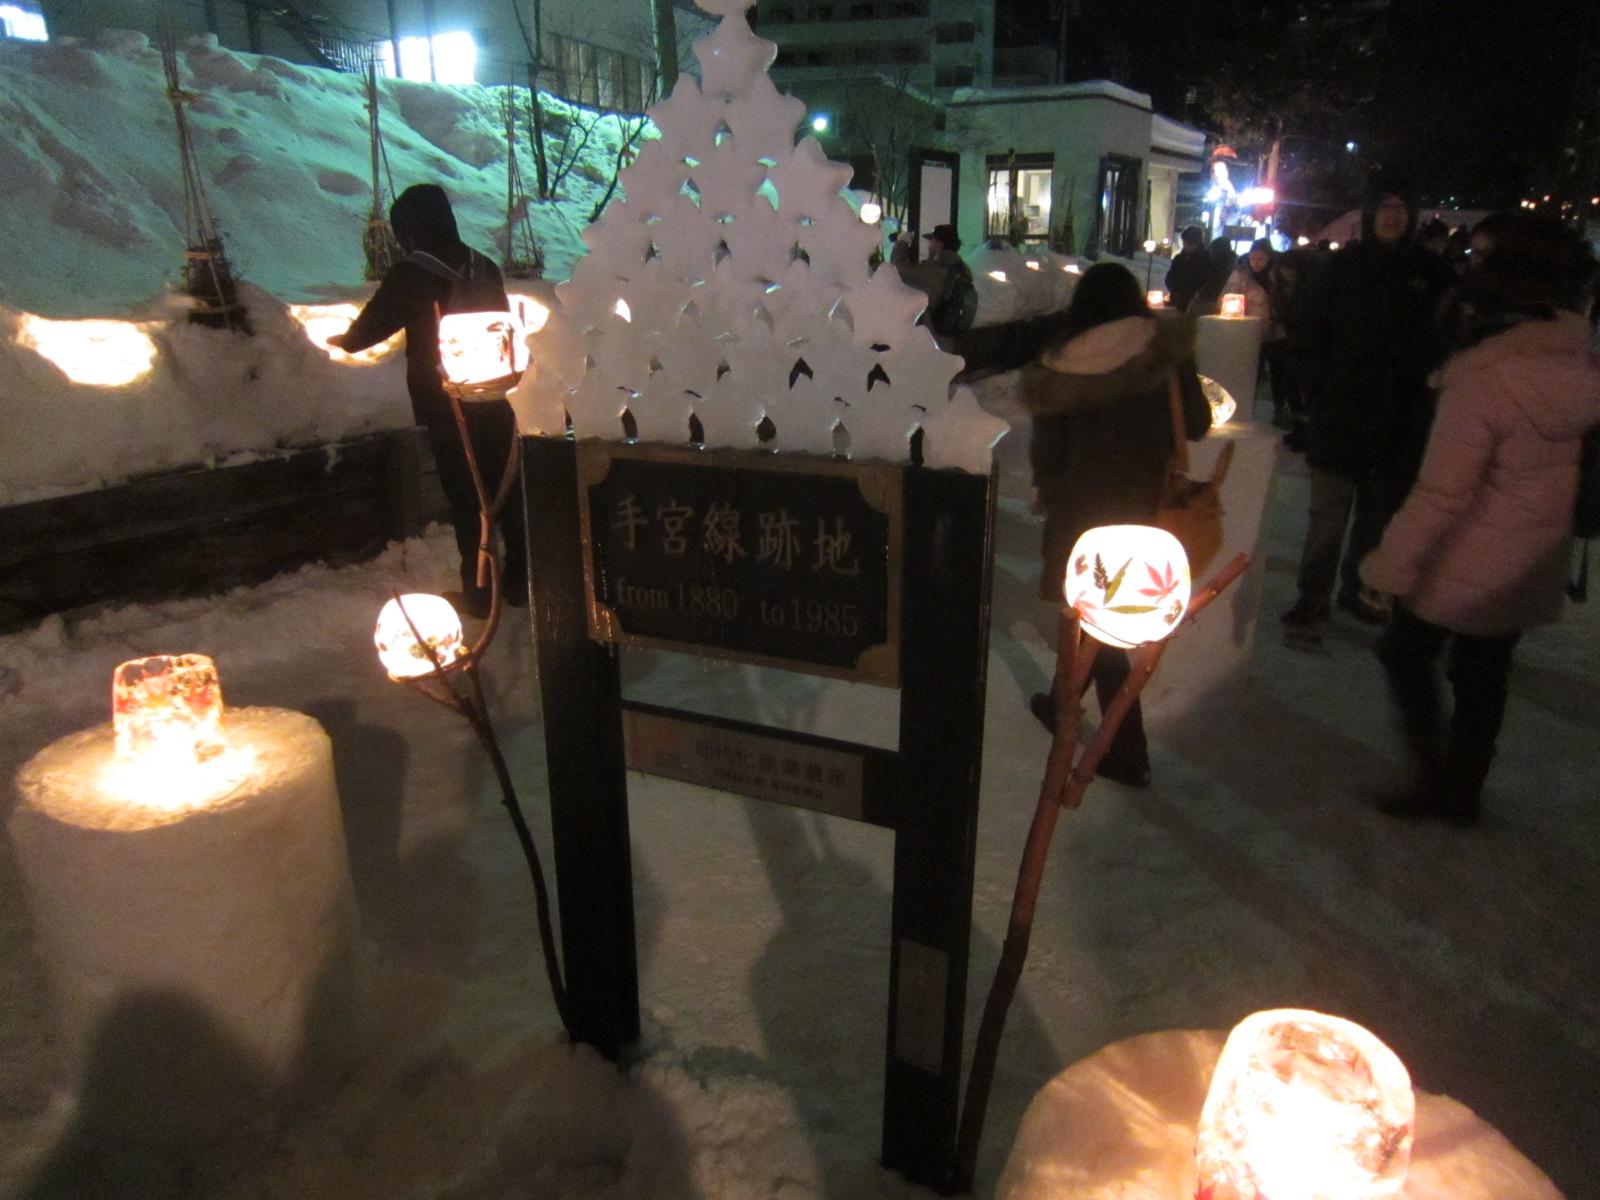 IMG 0069 - 第18回 小樽雪あかりの路2016 夜の部 / 後編